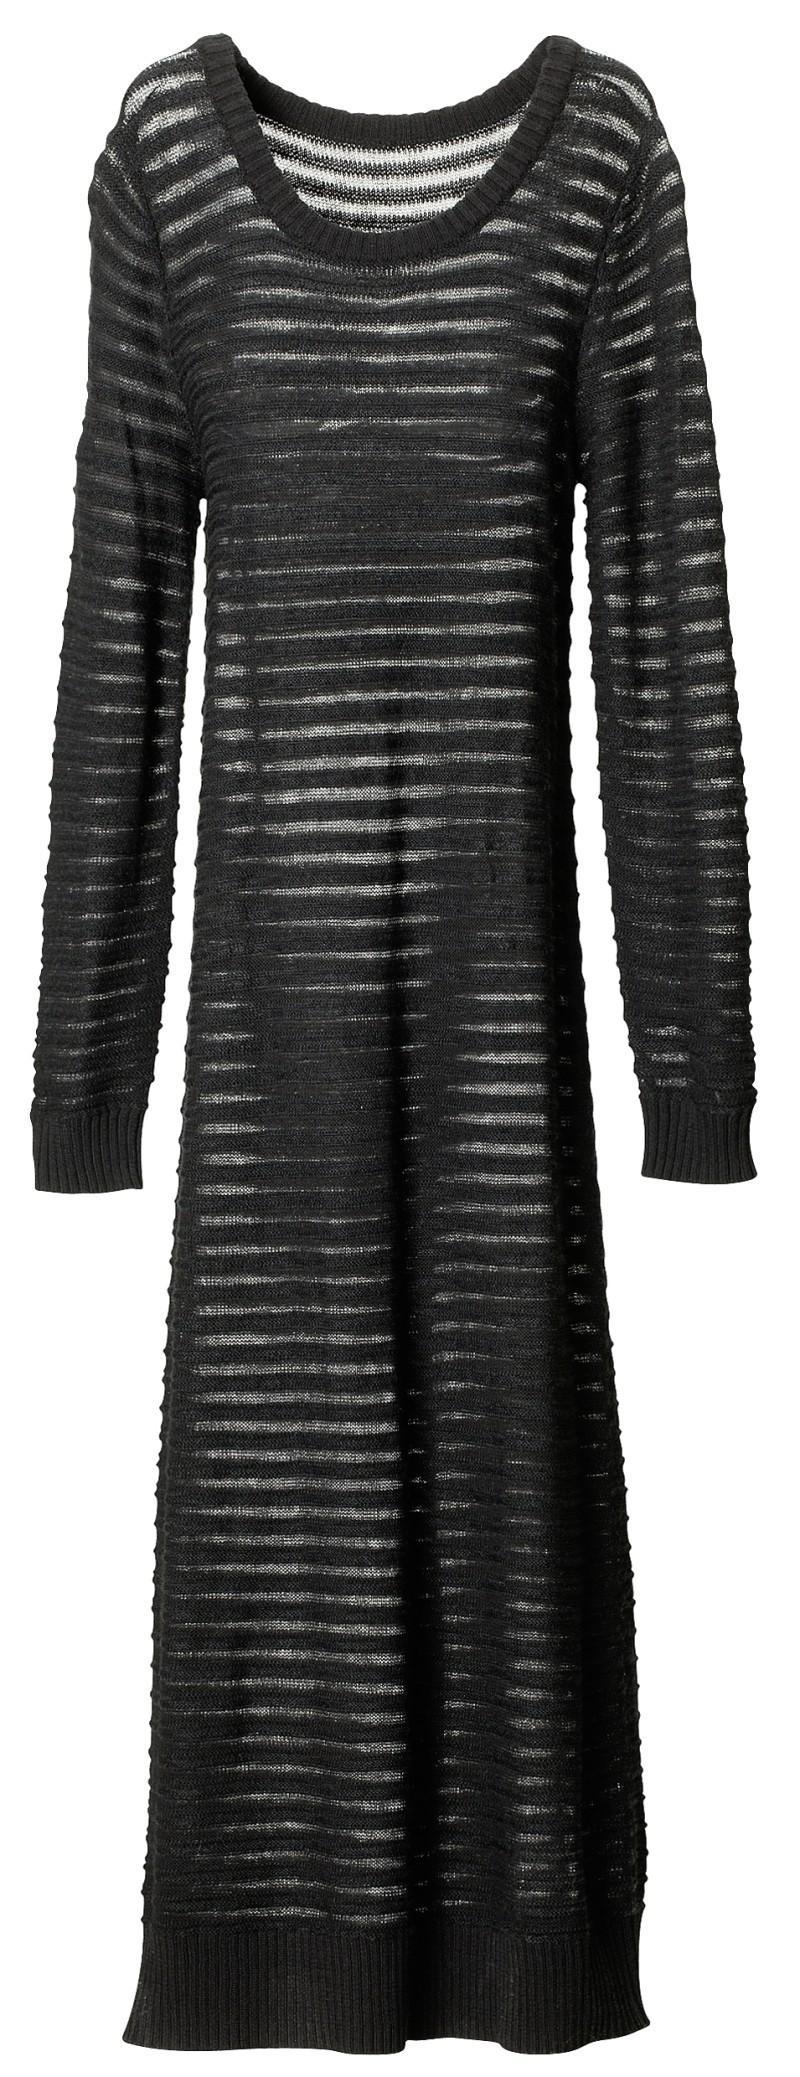 czarna sukienka H&M - jesień/zima 2010